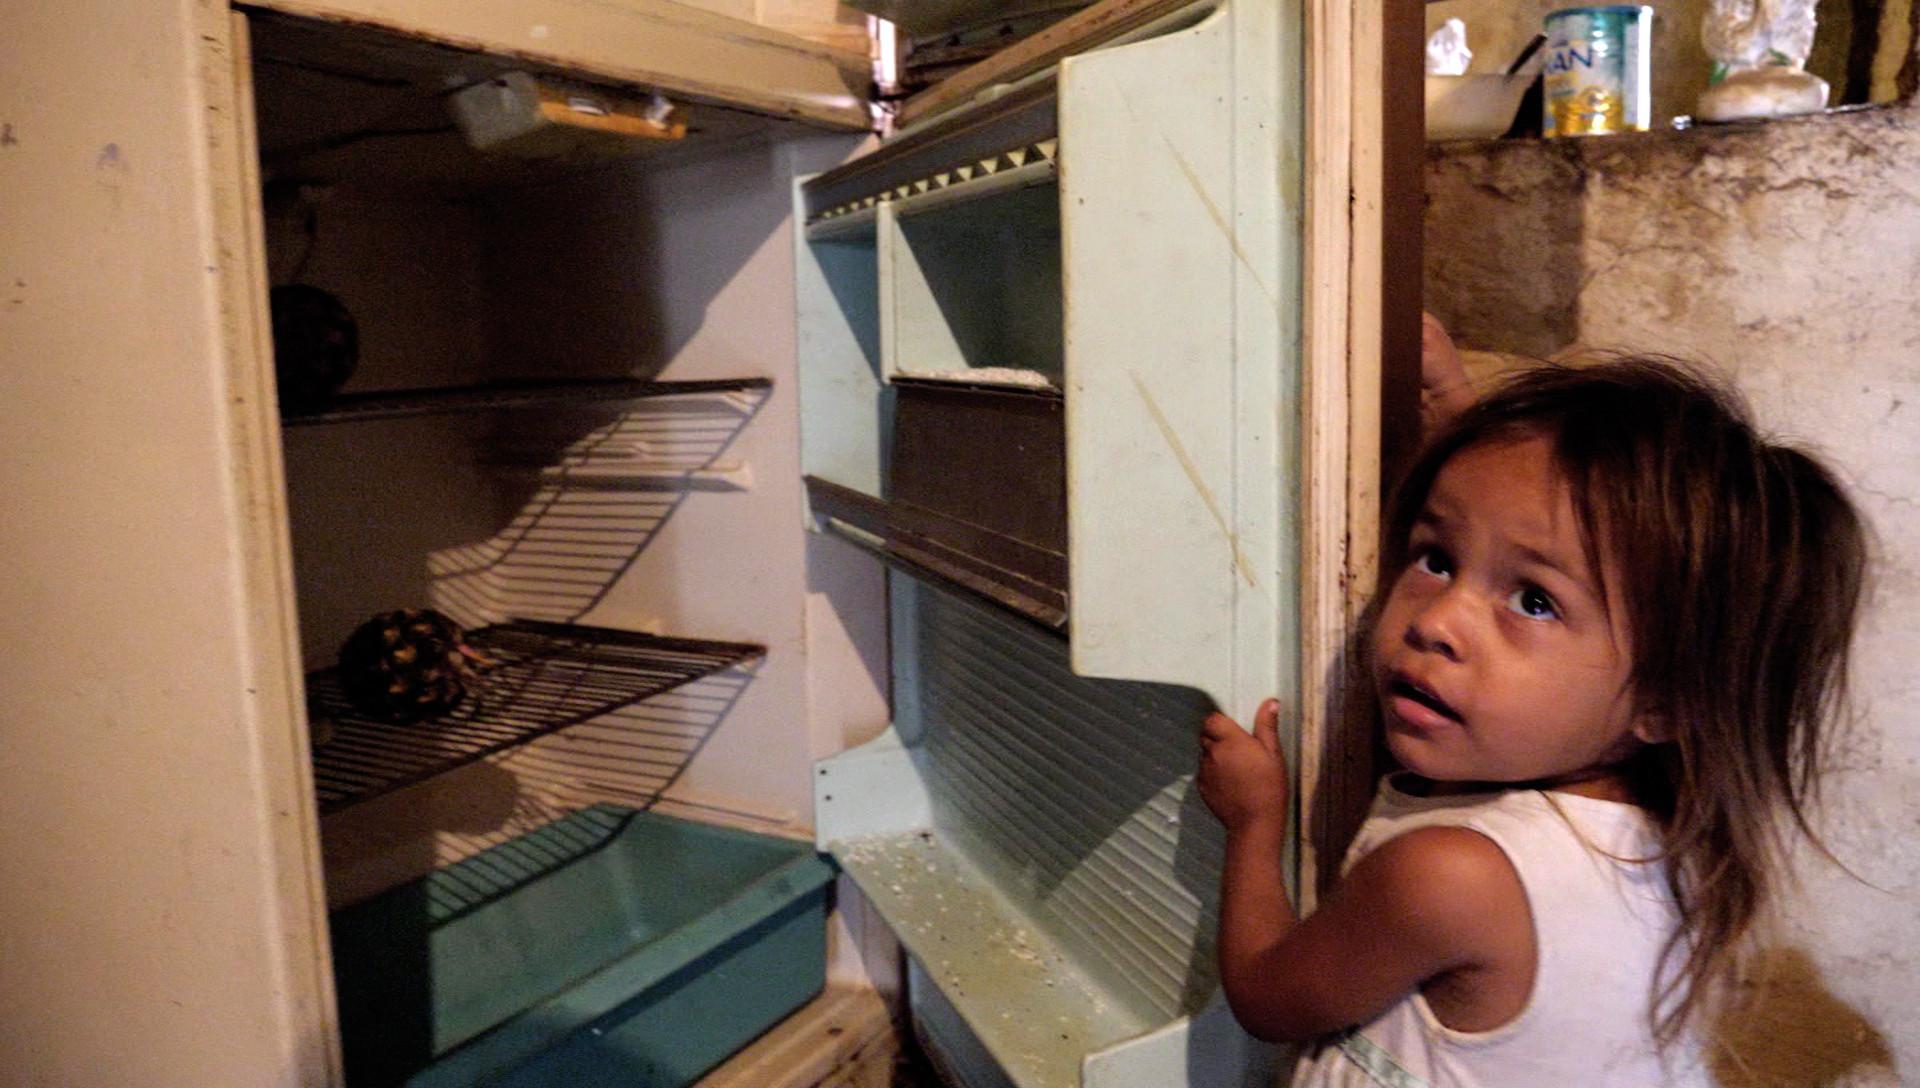 170515170602-04-venezuela-undercover-girl-empty-fridge